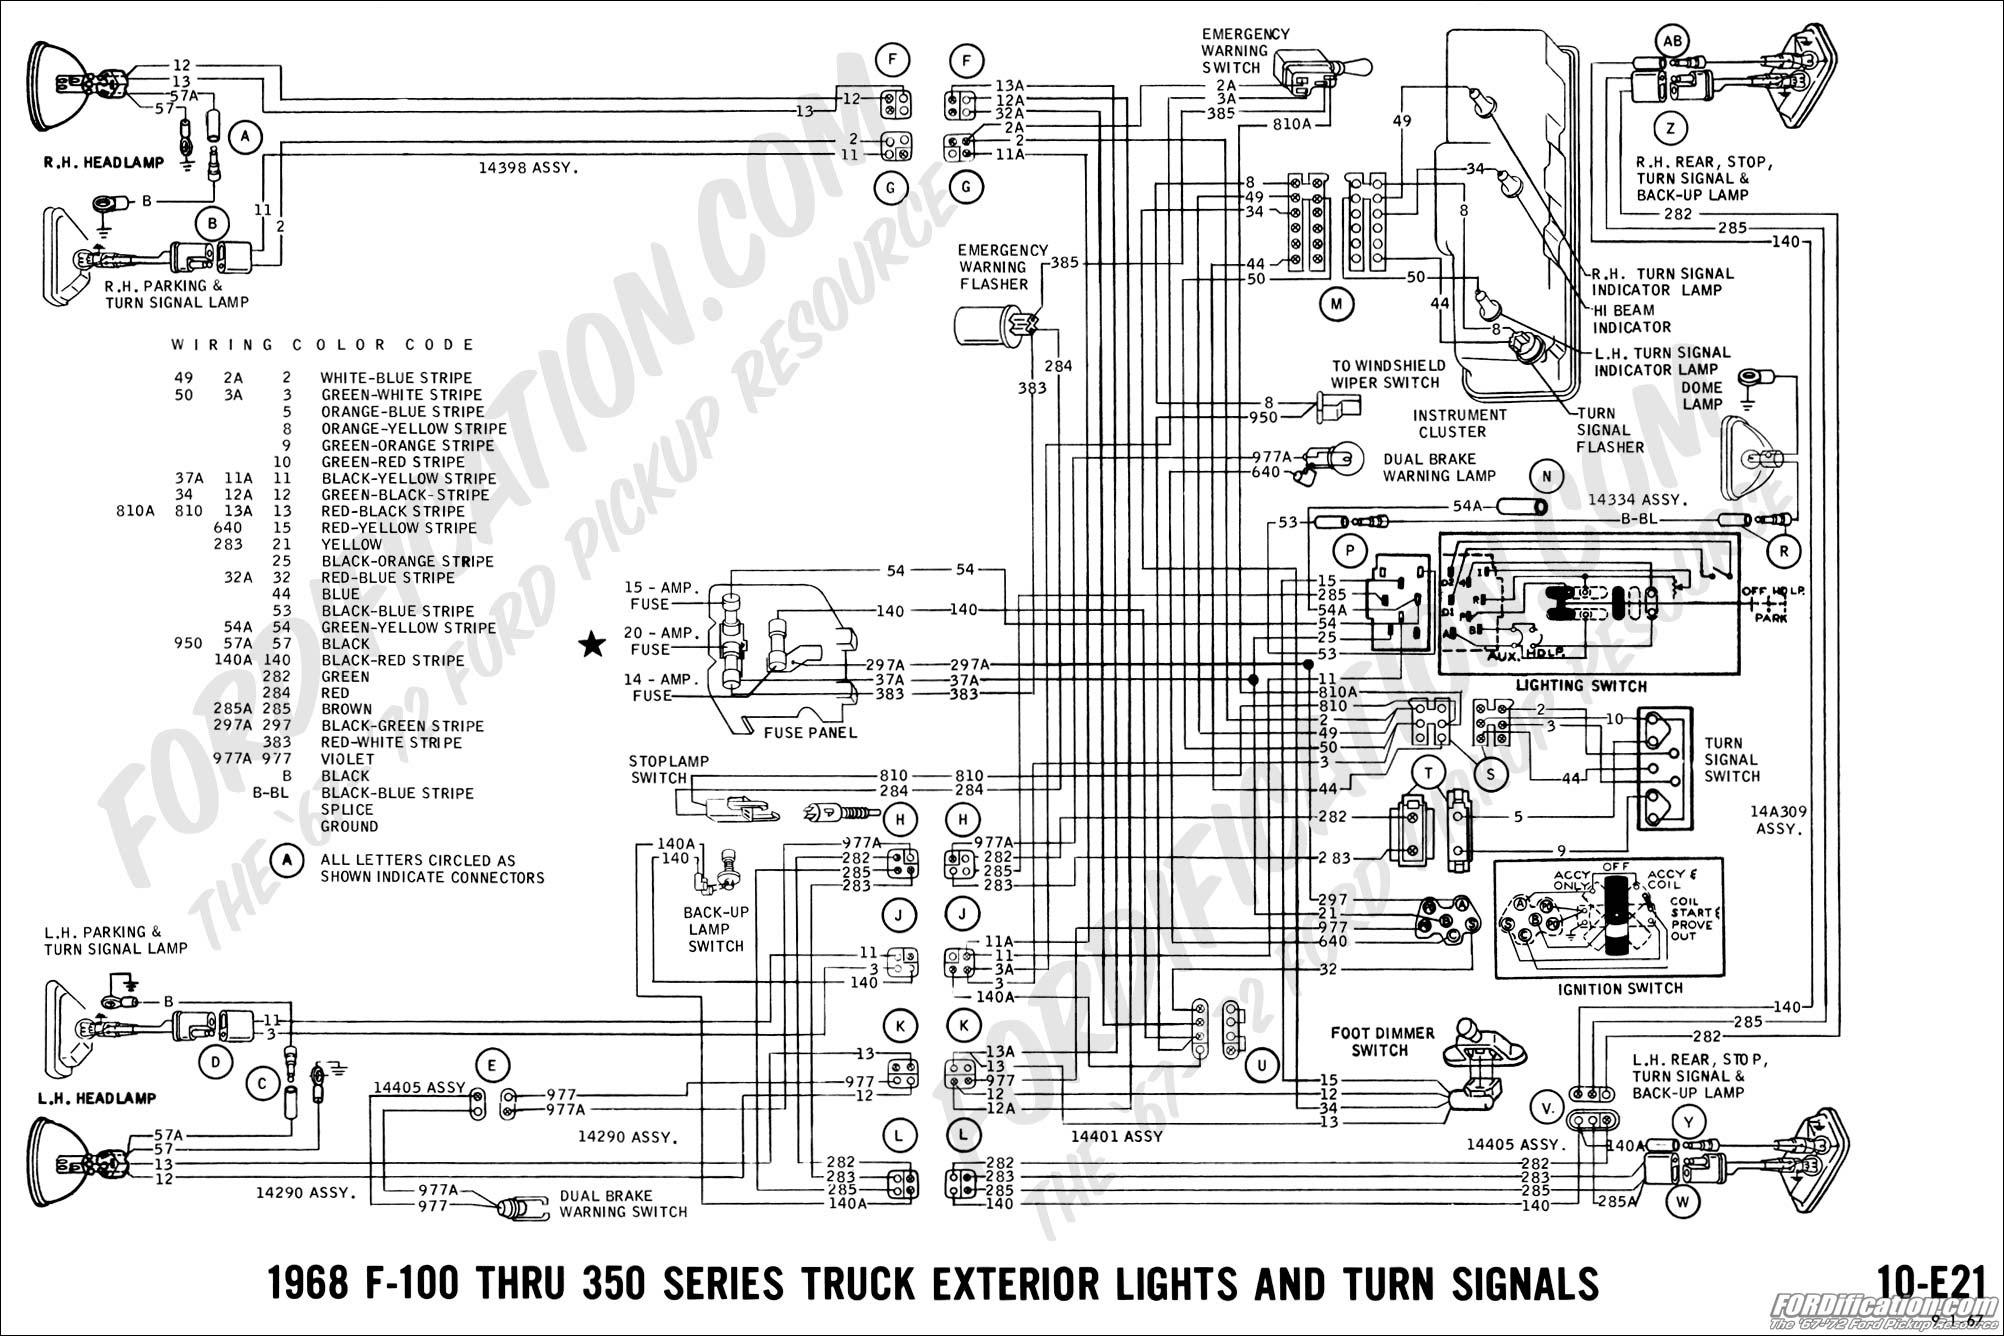 1967 Thunderbird Turn Signal Diagram Wiring Schematic Wiring Diagram Information Information Musikami It